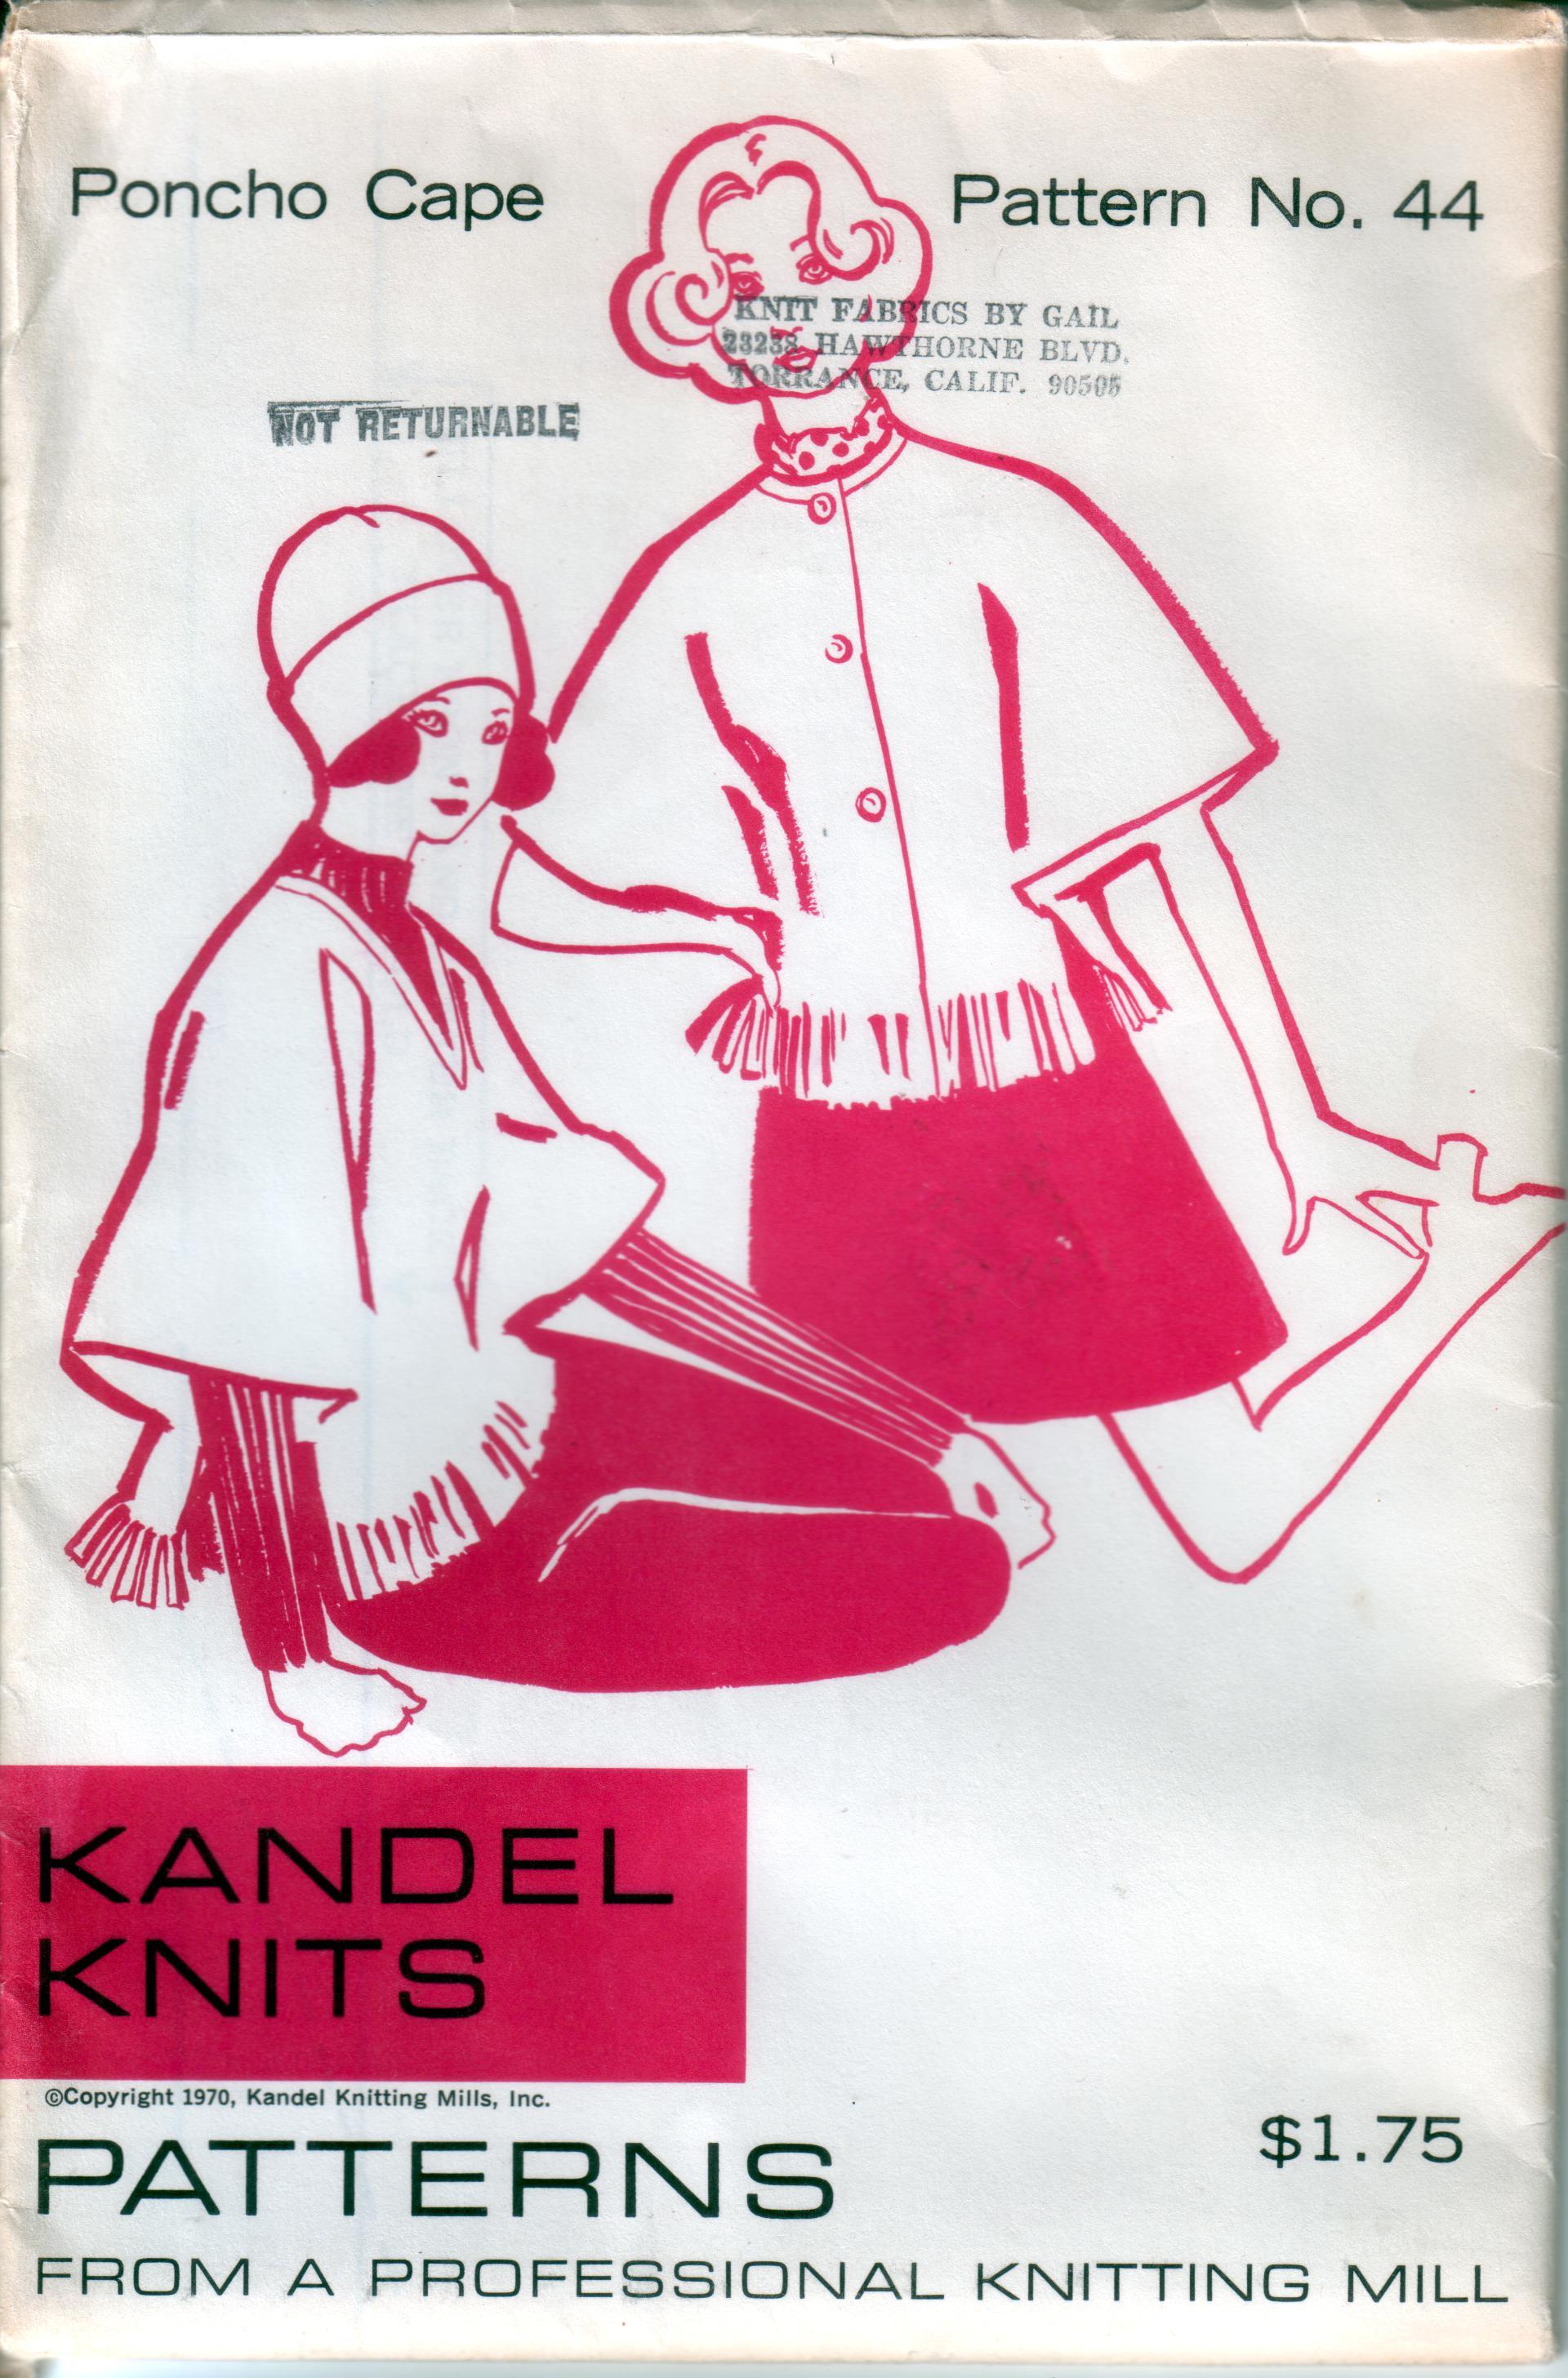 Kandel Knits 44